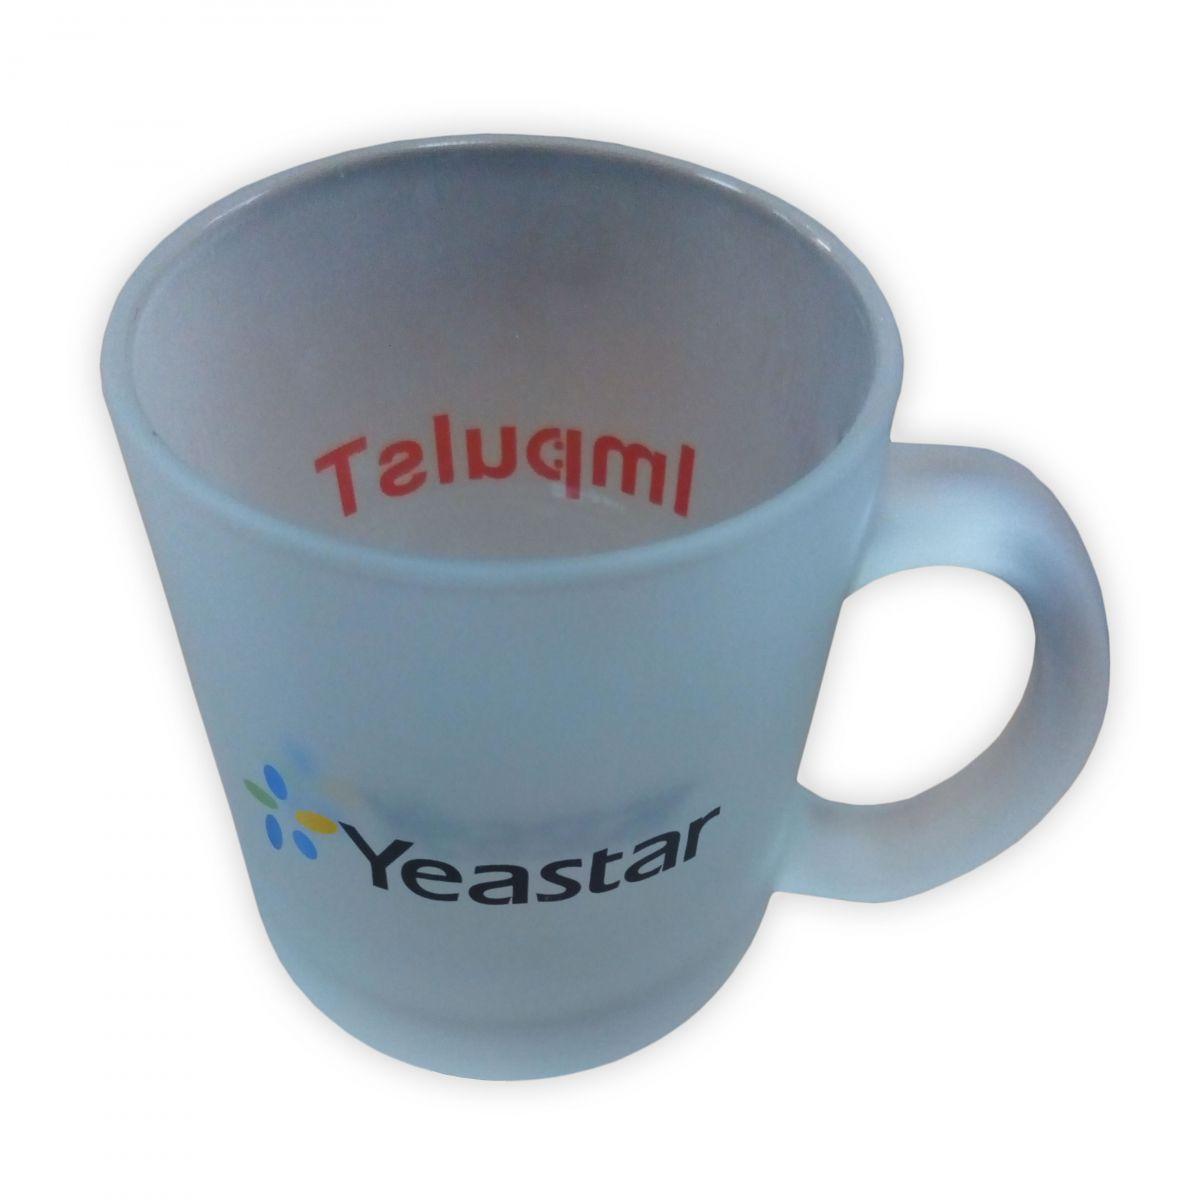 Šolja Yeastar-ImpulsT